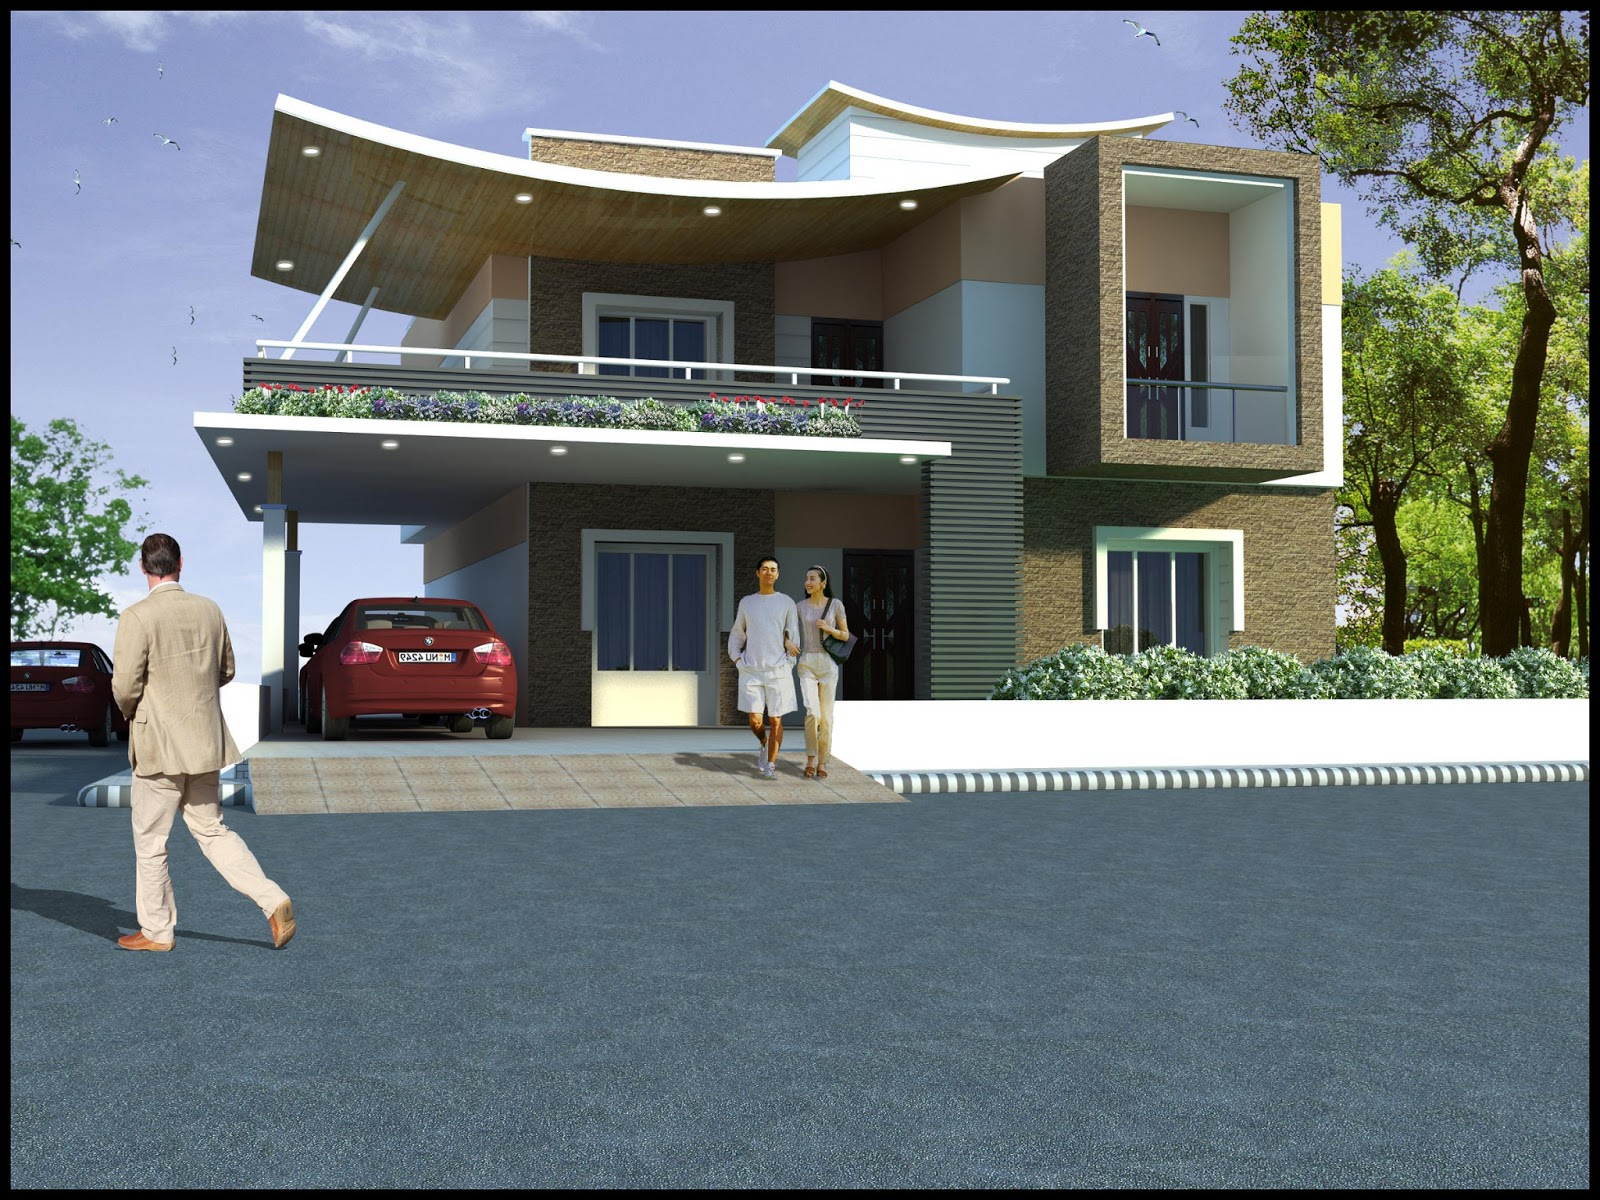 Duplex House Elevation Images | Joy Studio Design Gallery - Best ...